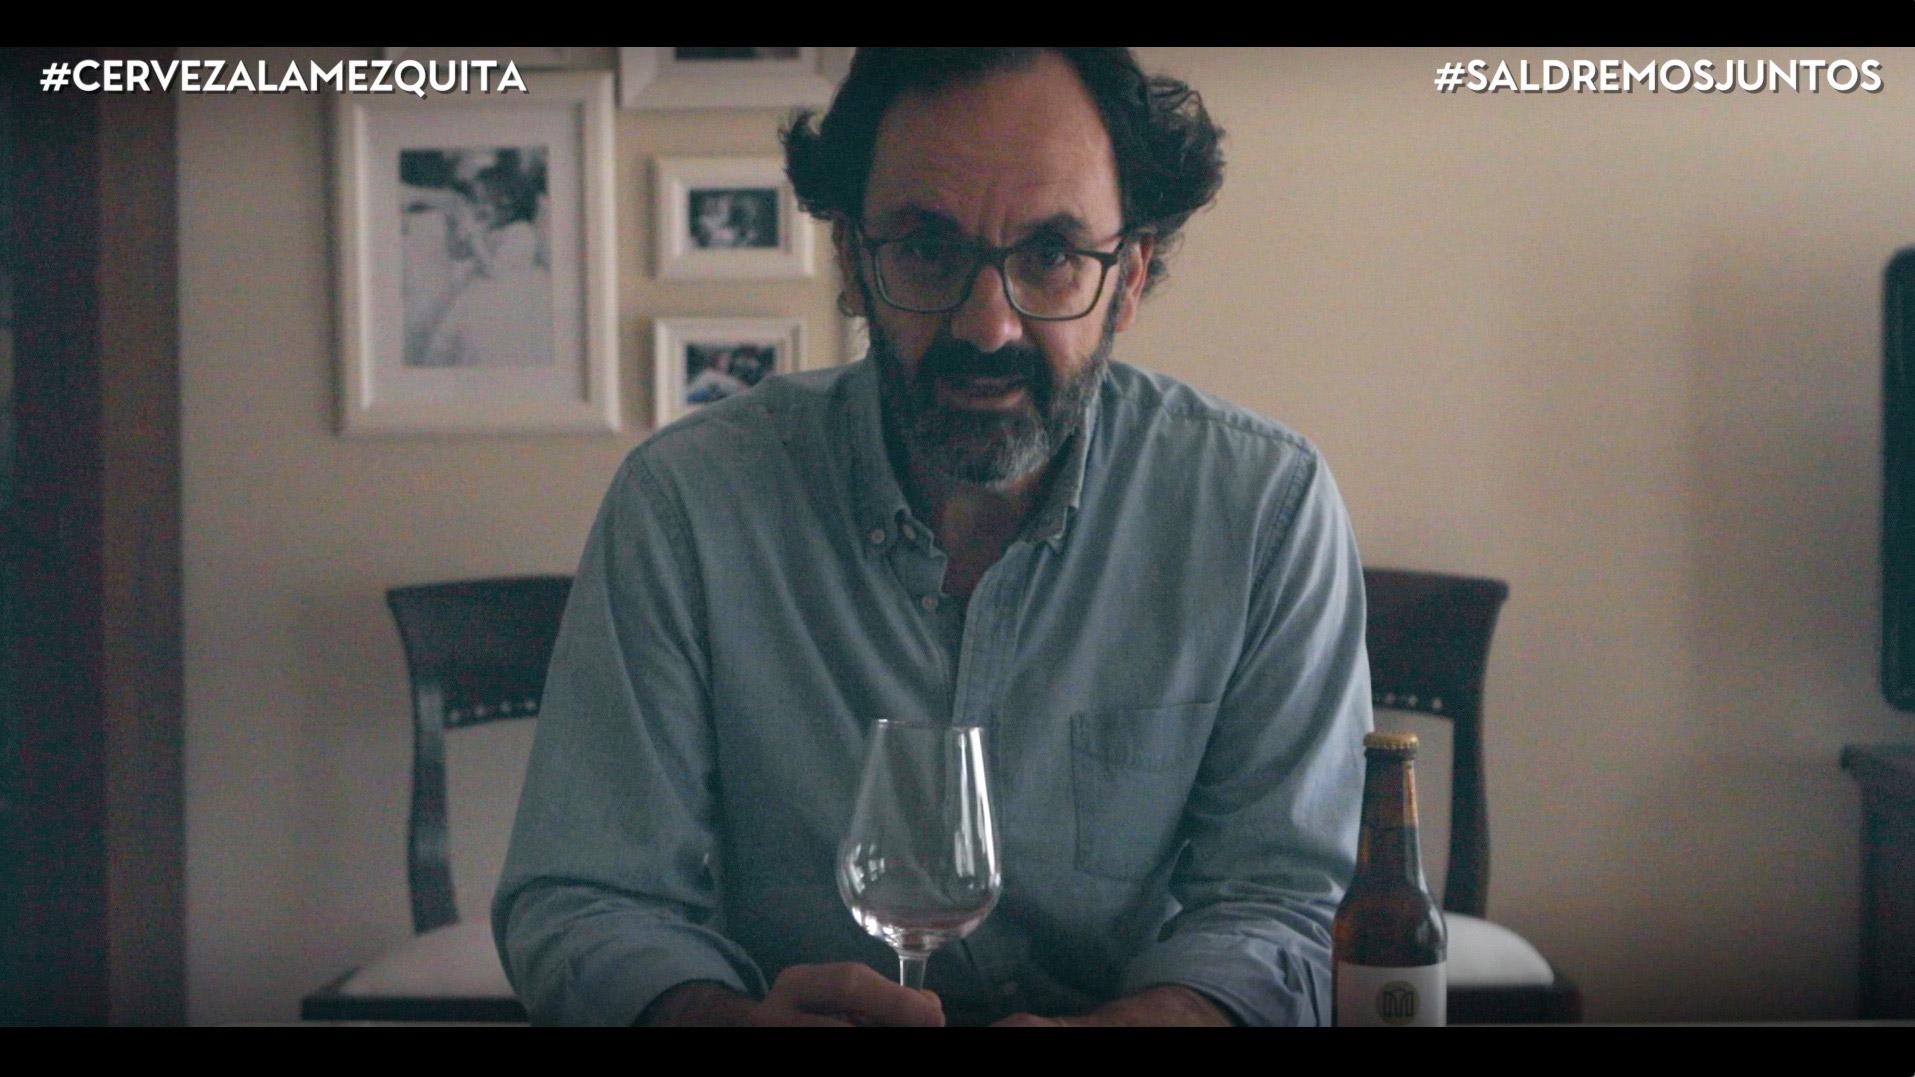 Alfonso Fernández, hace una cata de Cerveza La Mezquita